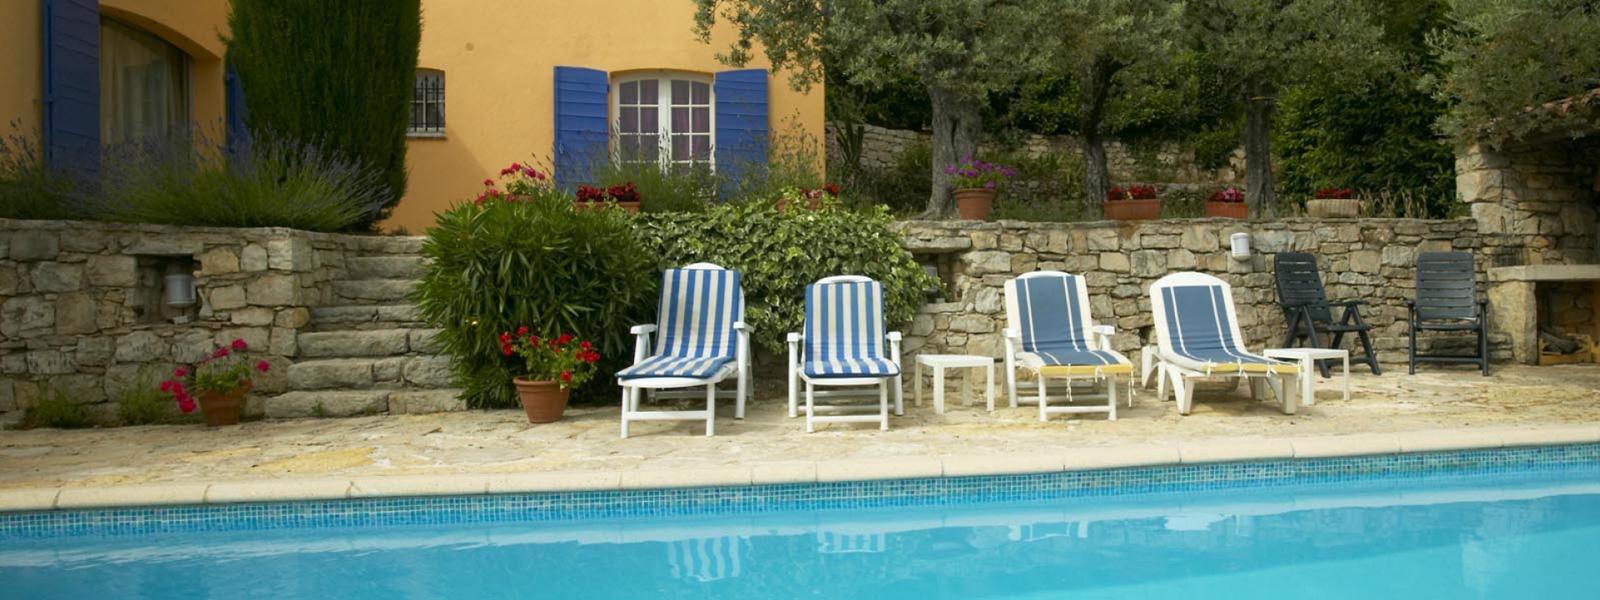 https://selectcottages.com/sites/default/files/revslider/image/villa-with-pool-provence.jpg